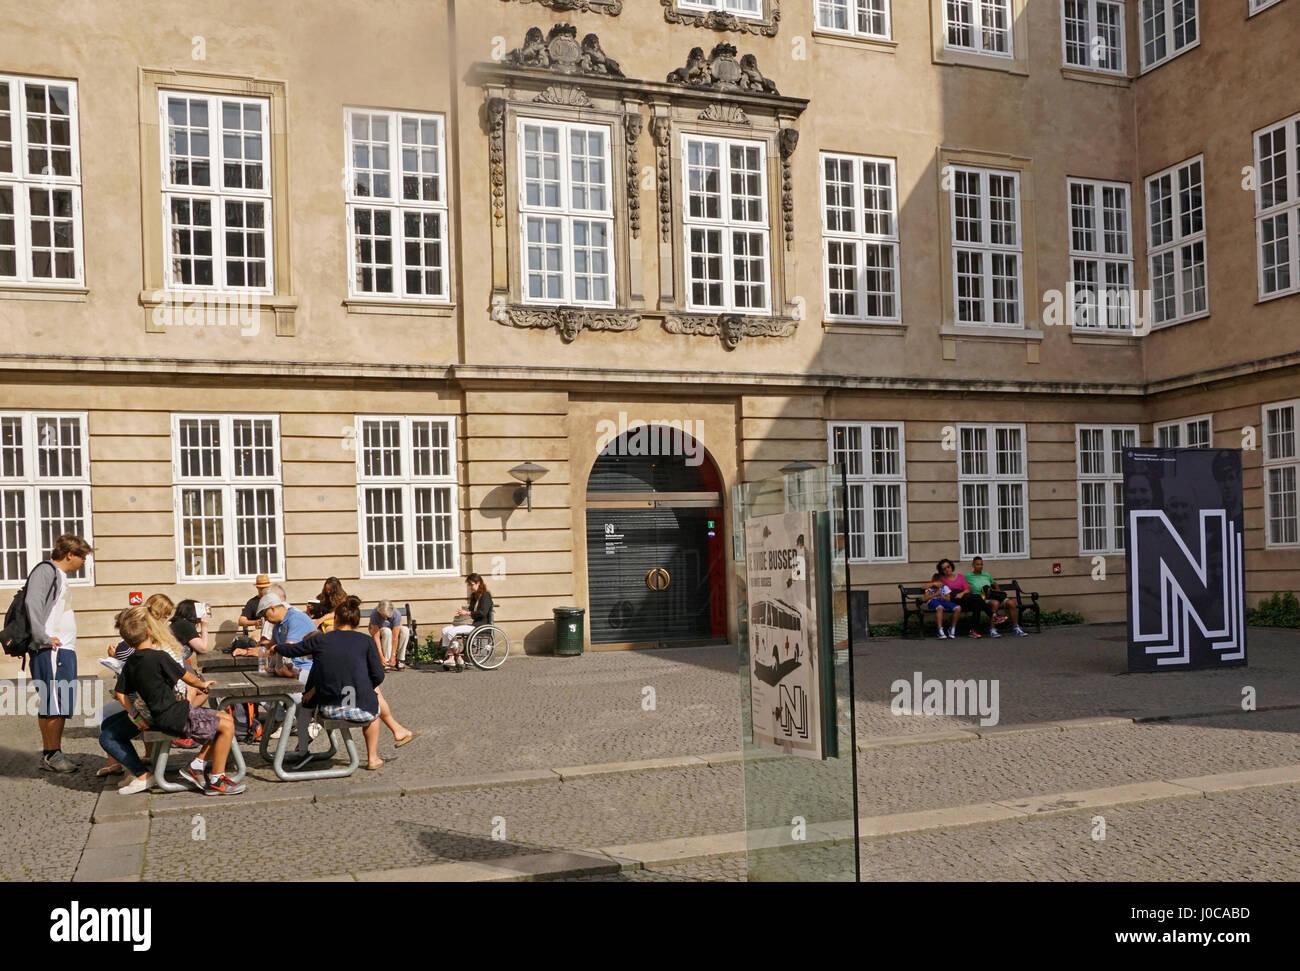 National Museum of Denmark, main entrance courtyard, in Copenhagen. - Stock Image